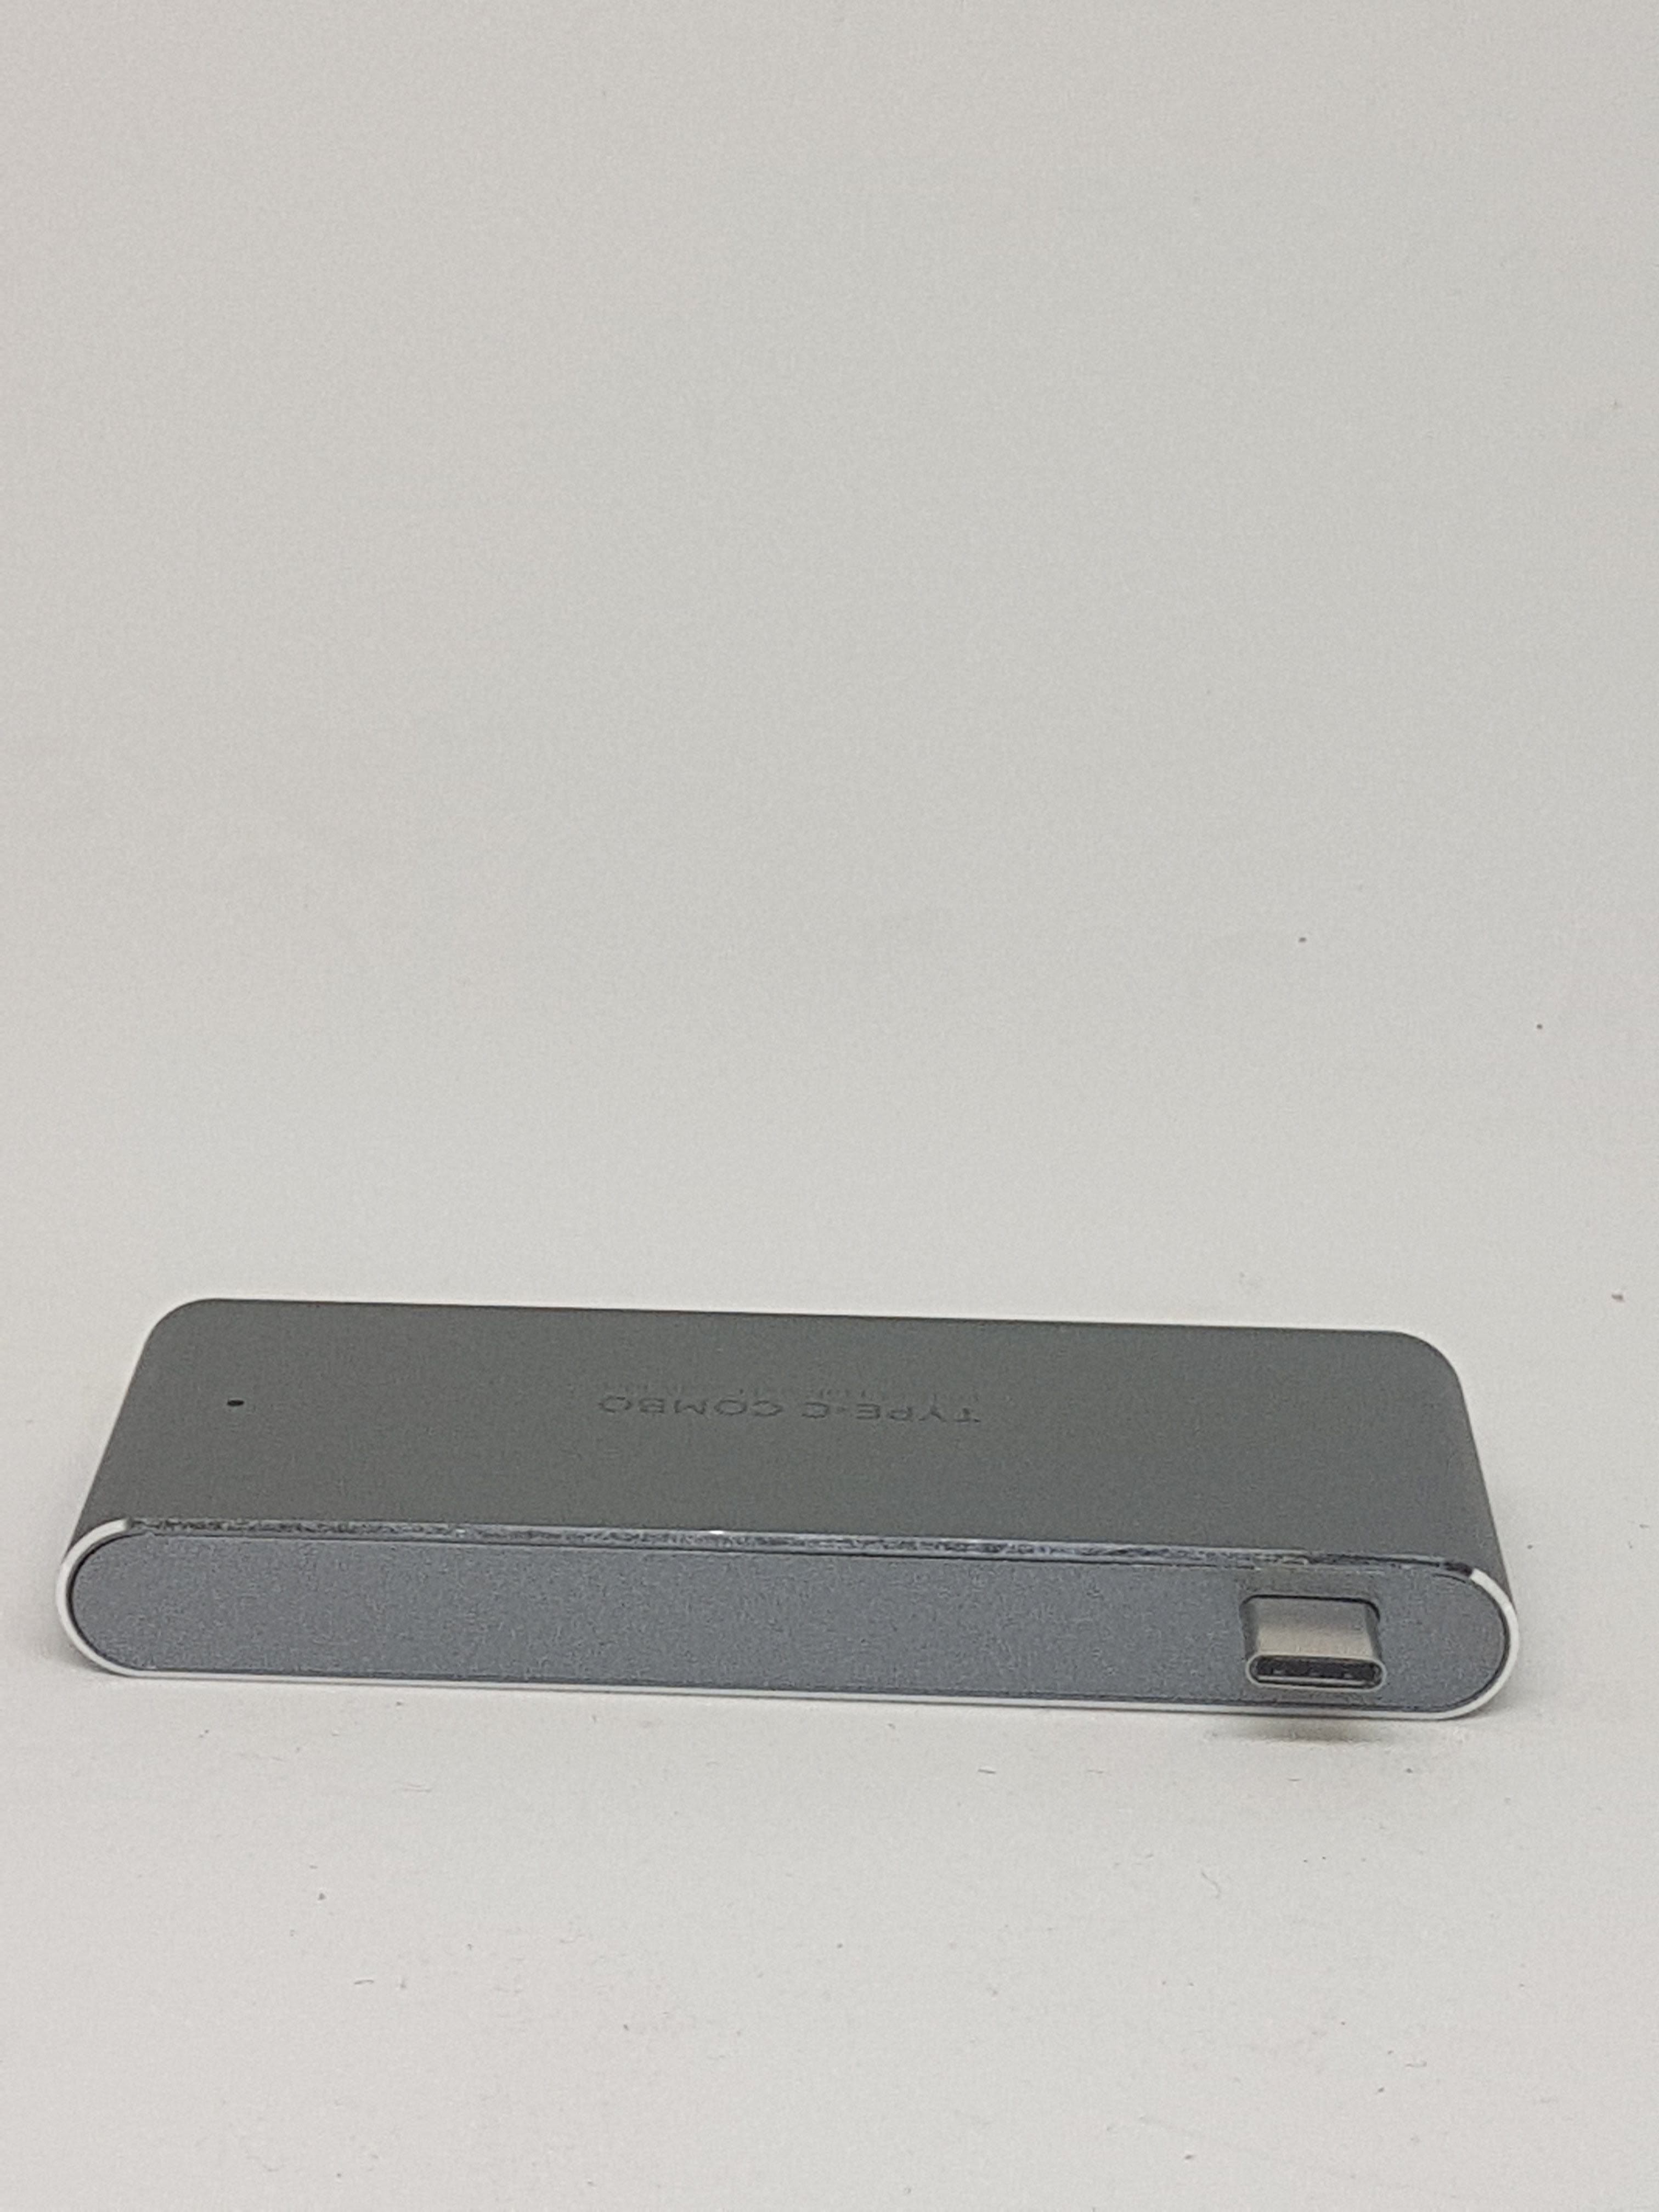 AOPETIO-Hub-USB-C - AOPETIO-Hub-USB-C-21.jpg